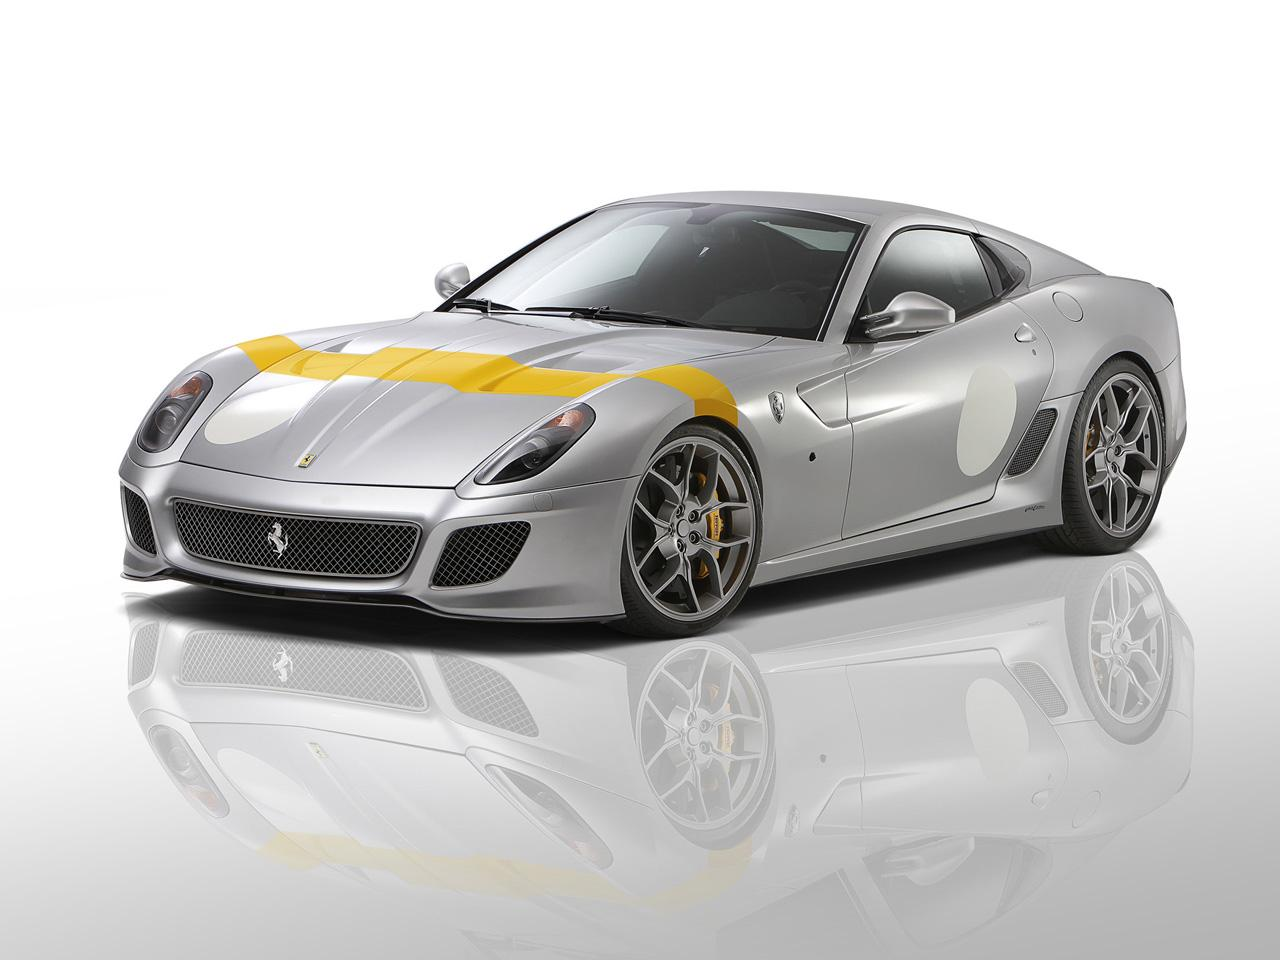 Ferrari Wallpapers By Cars Wallpapers Net Part 2